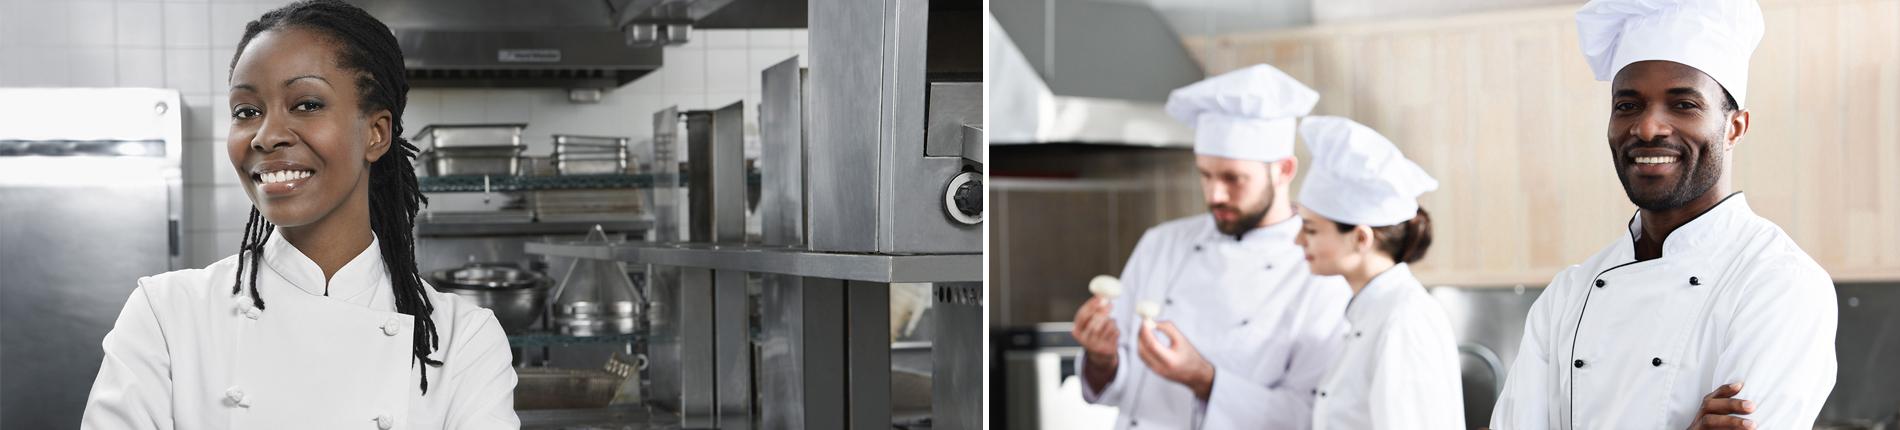 Culinary arts training program